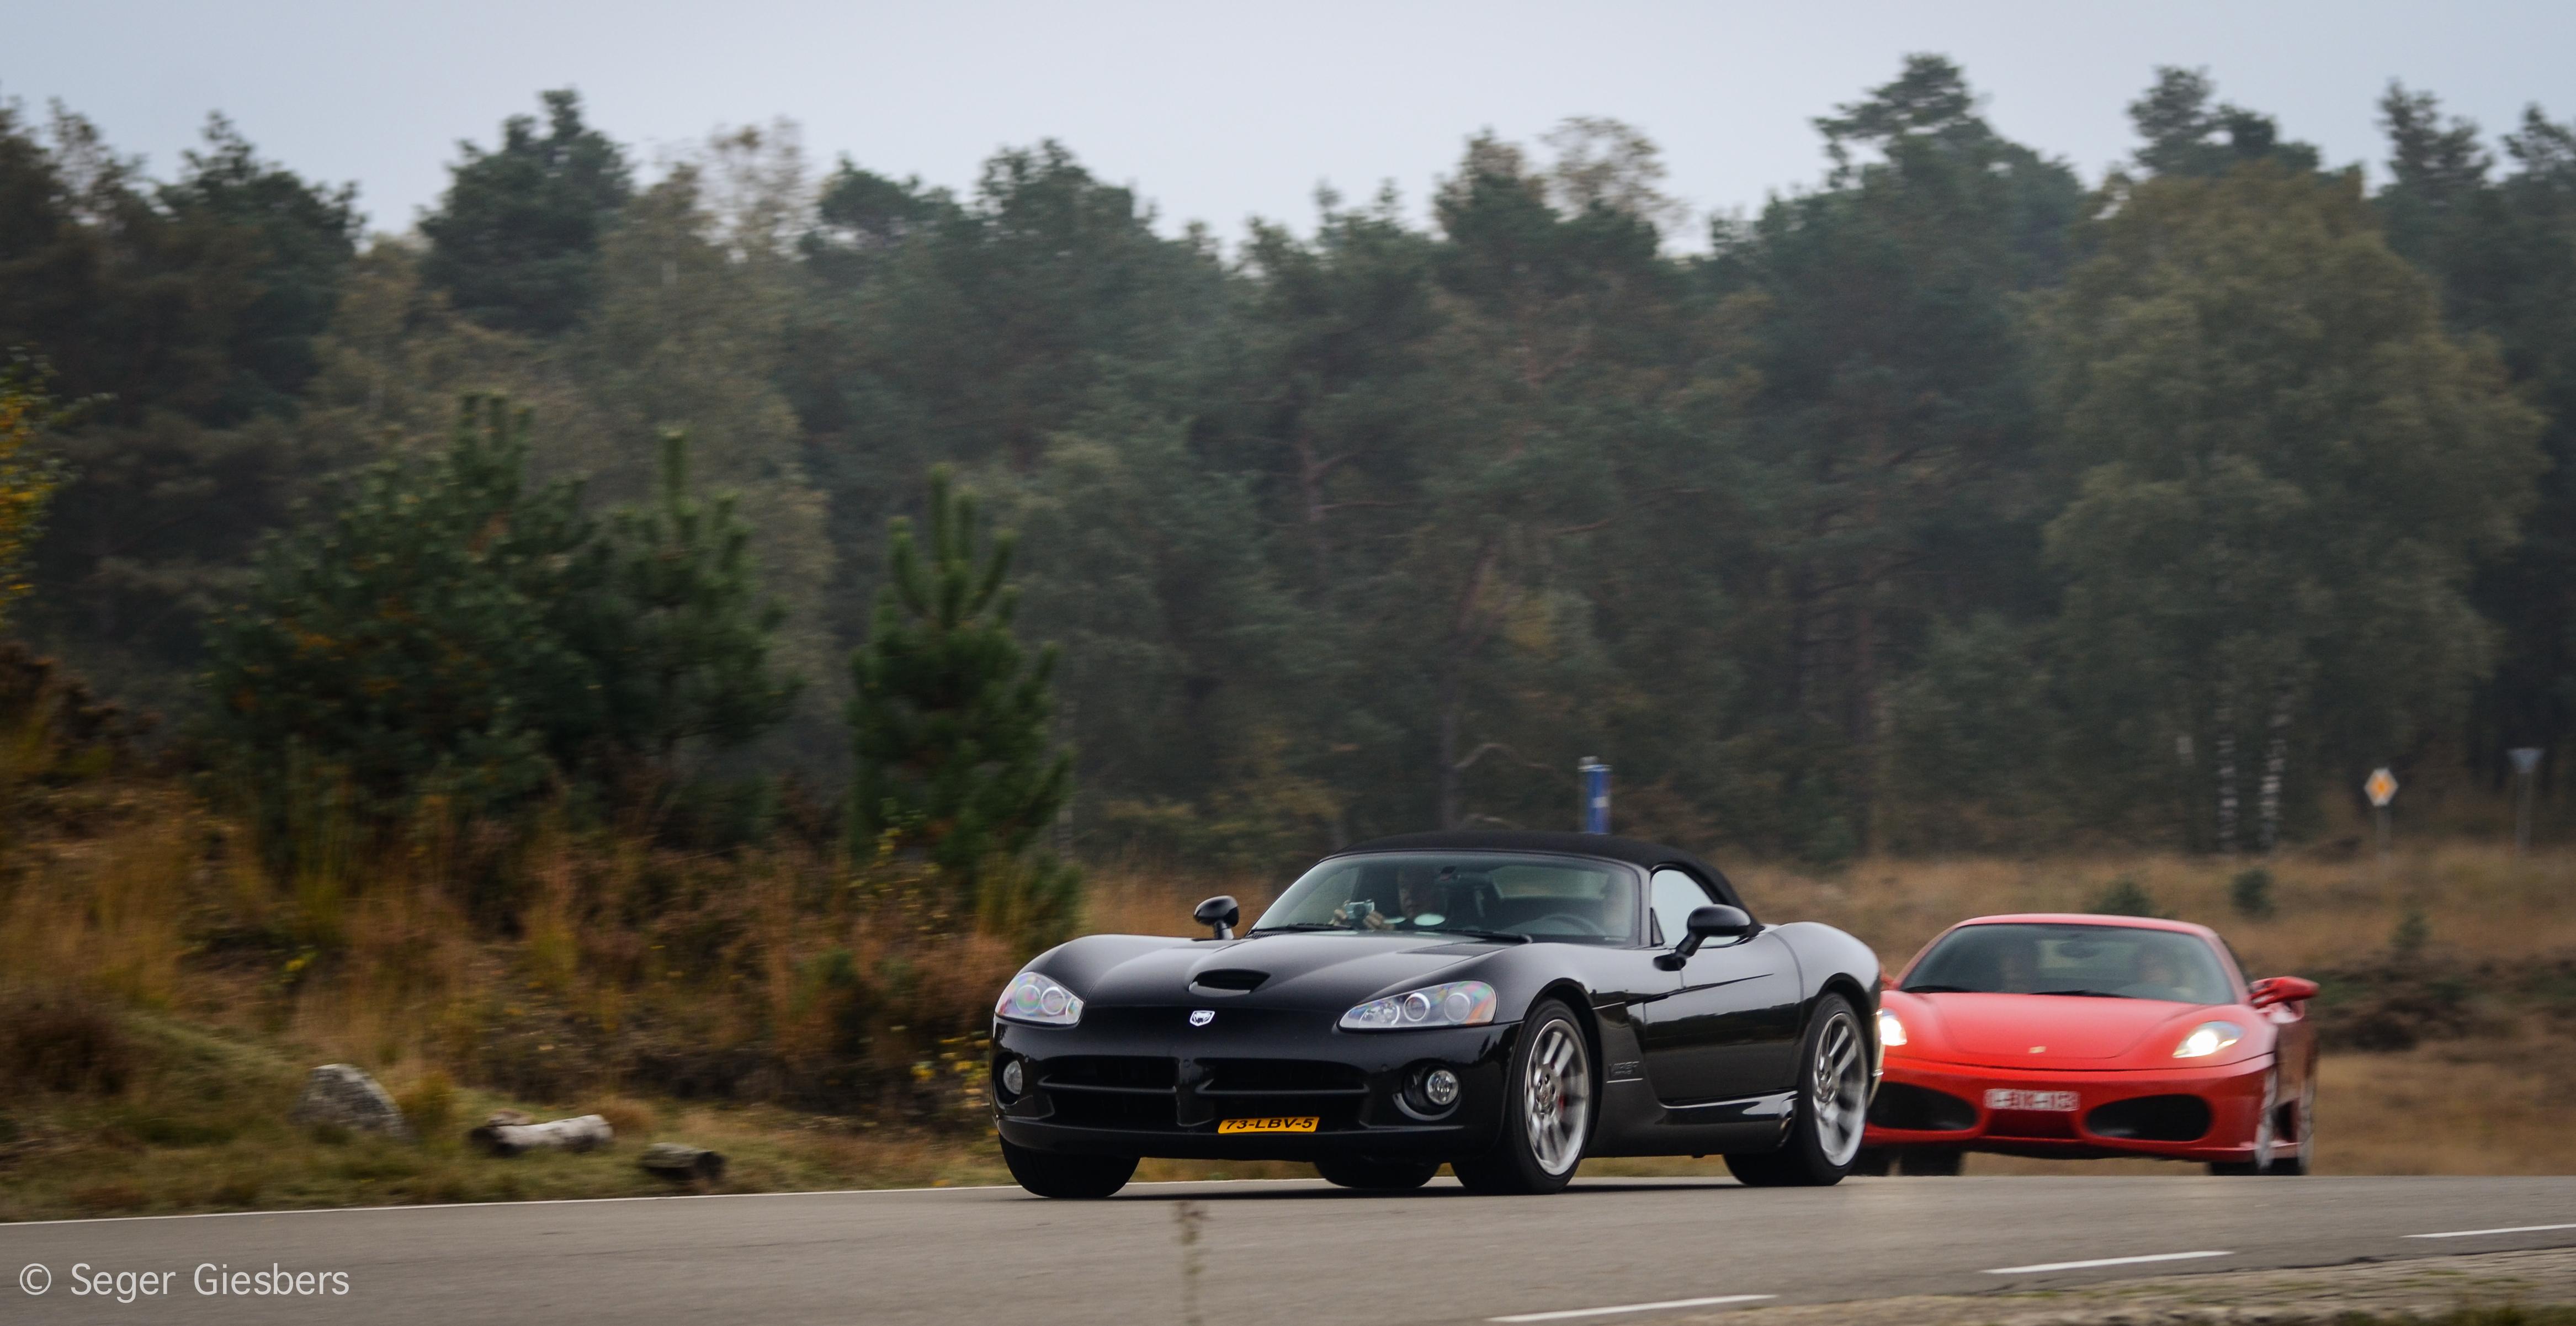 FHR 2012 - www.hartvoorautos.nl